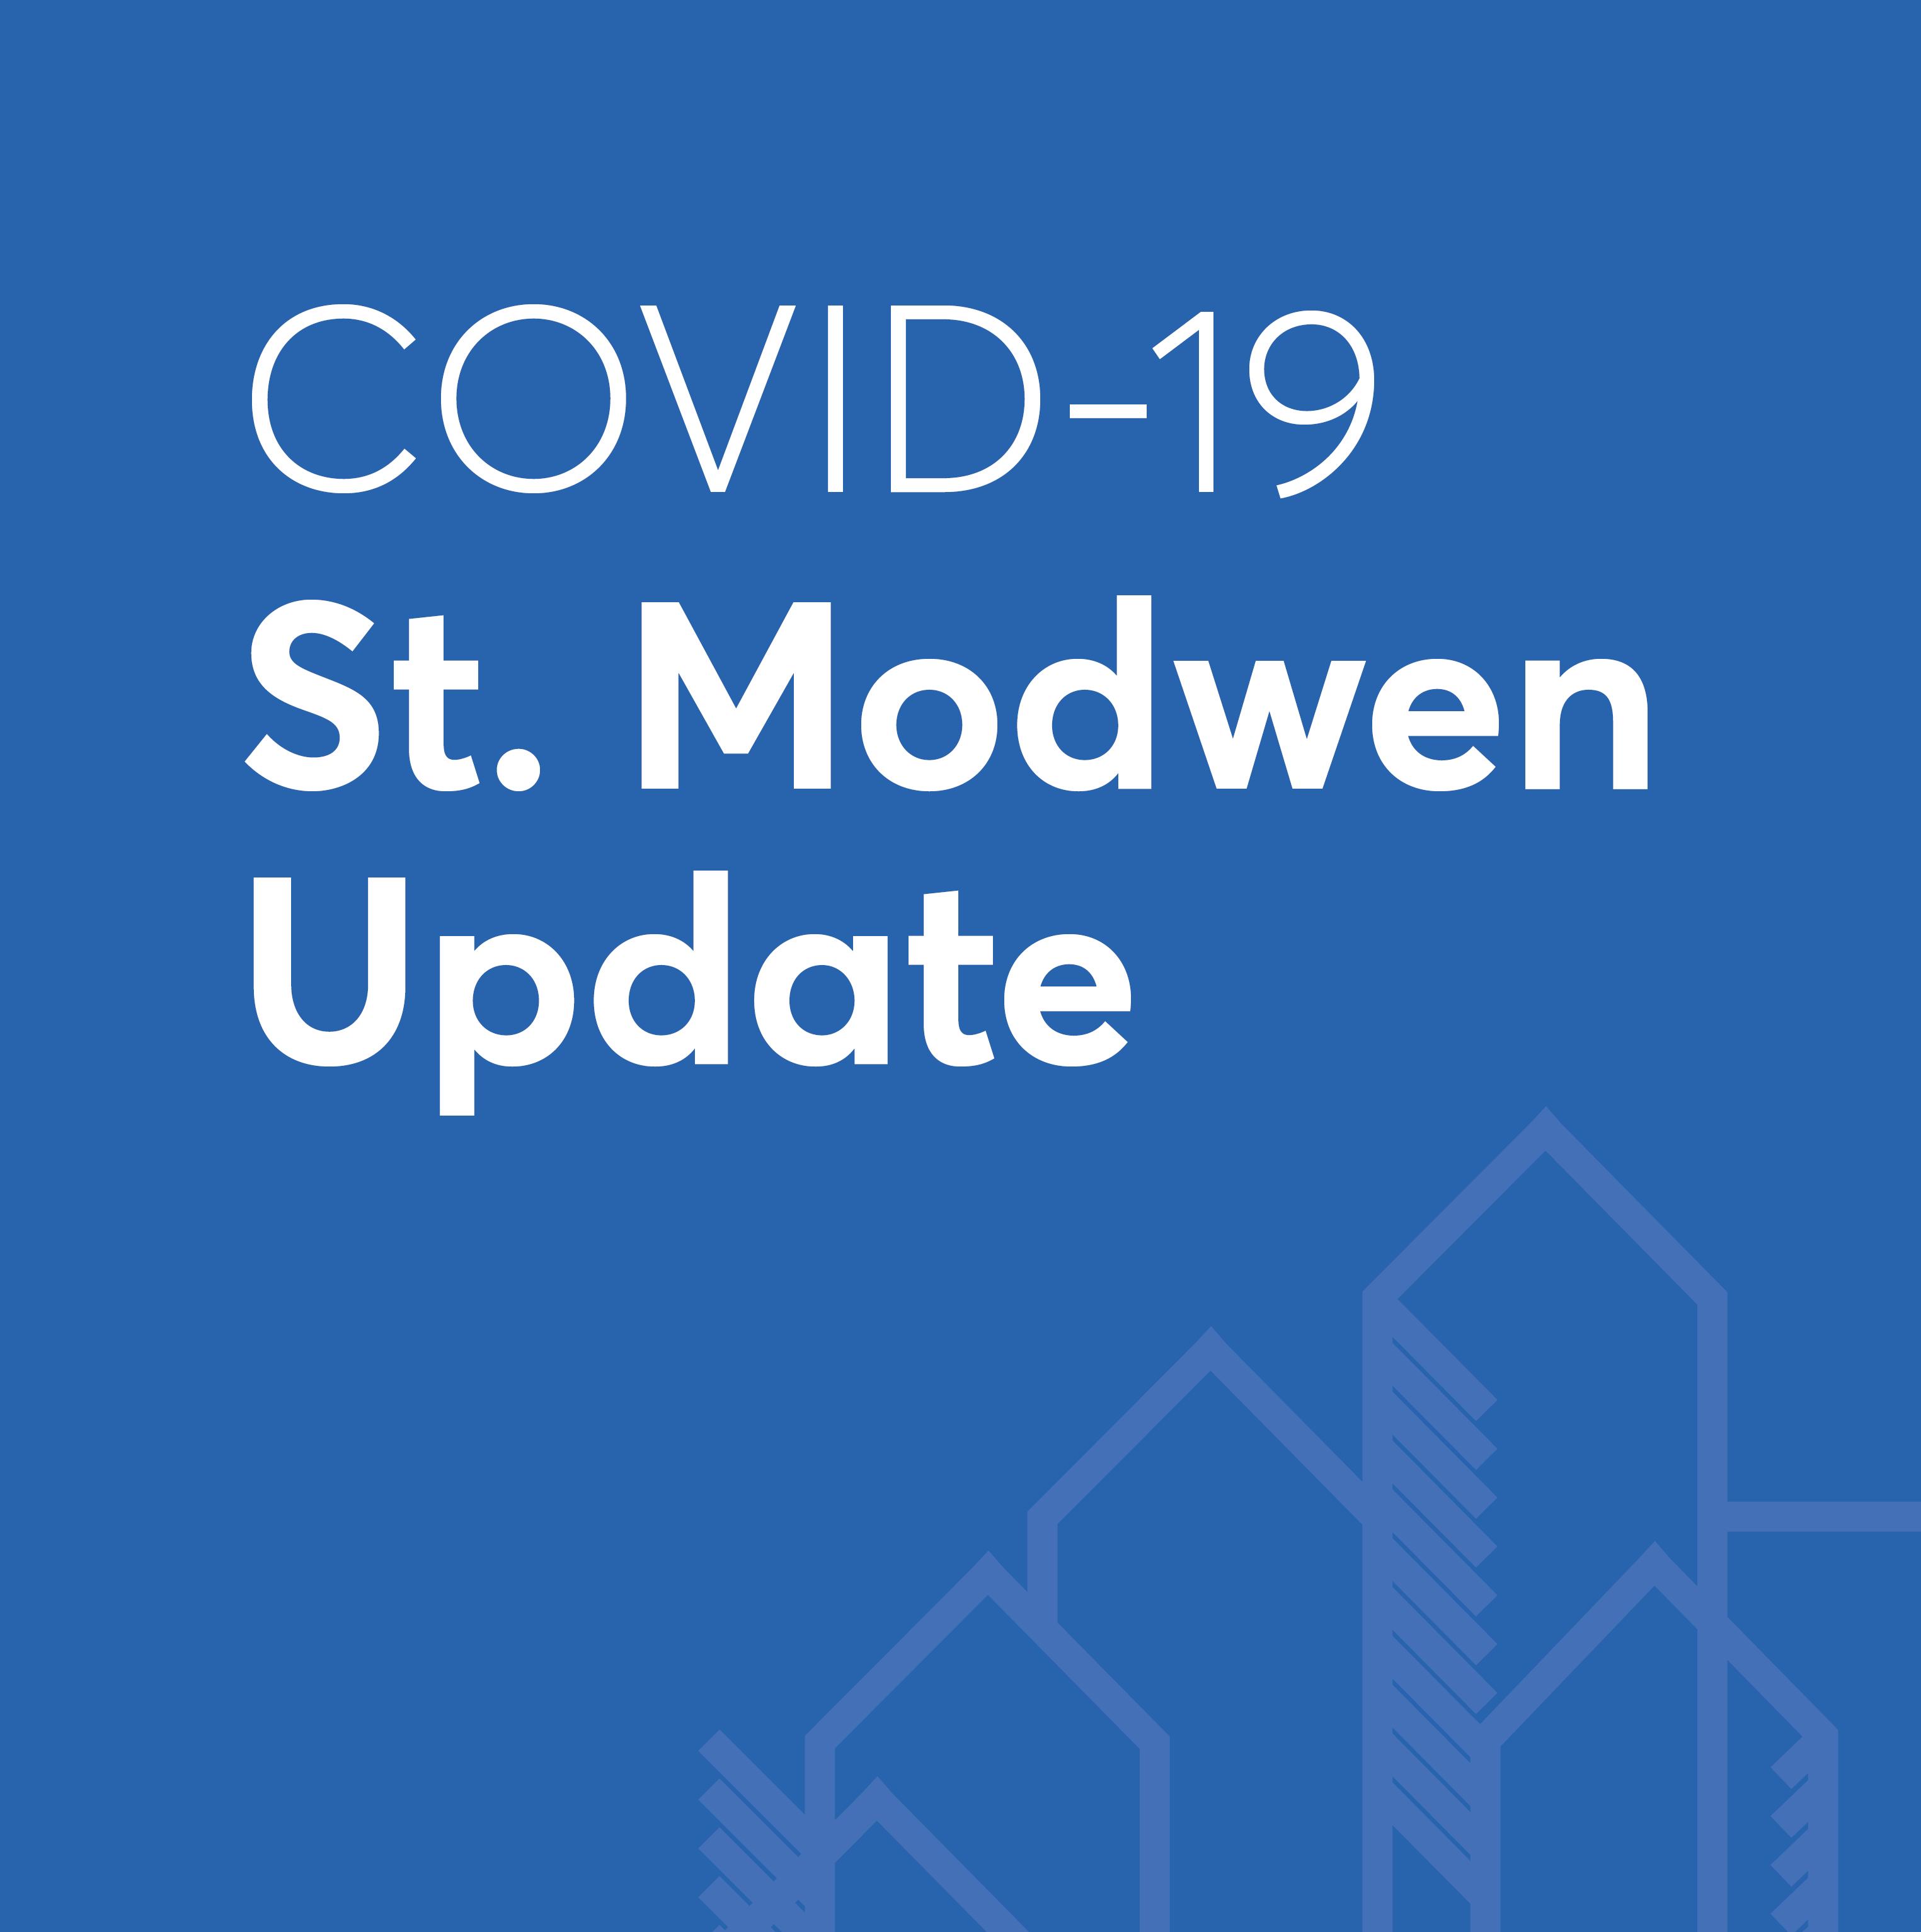 St. Modwen update on COVID-19